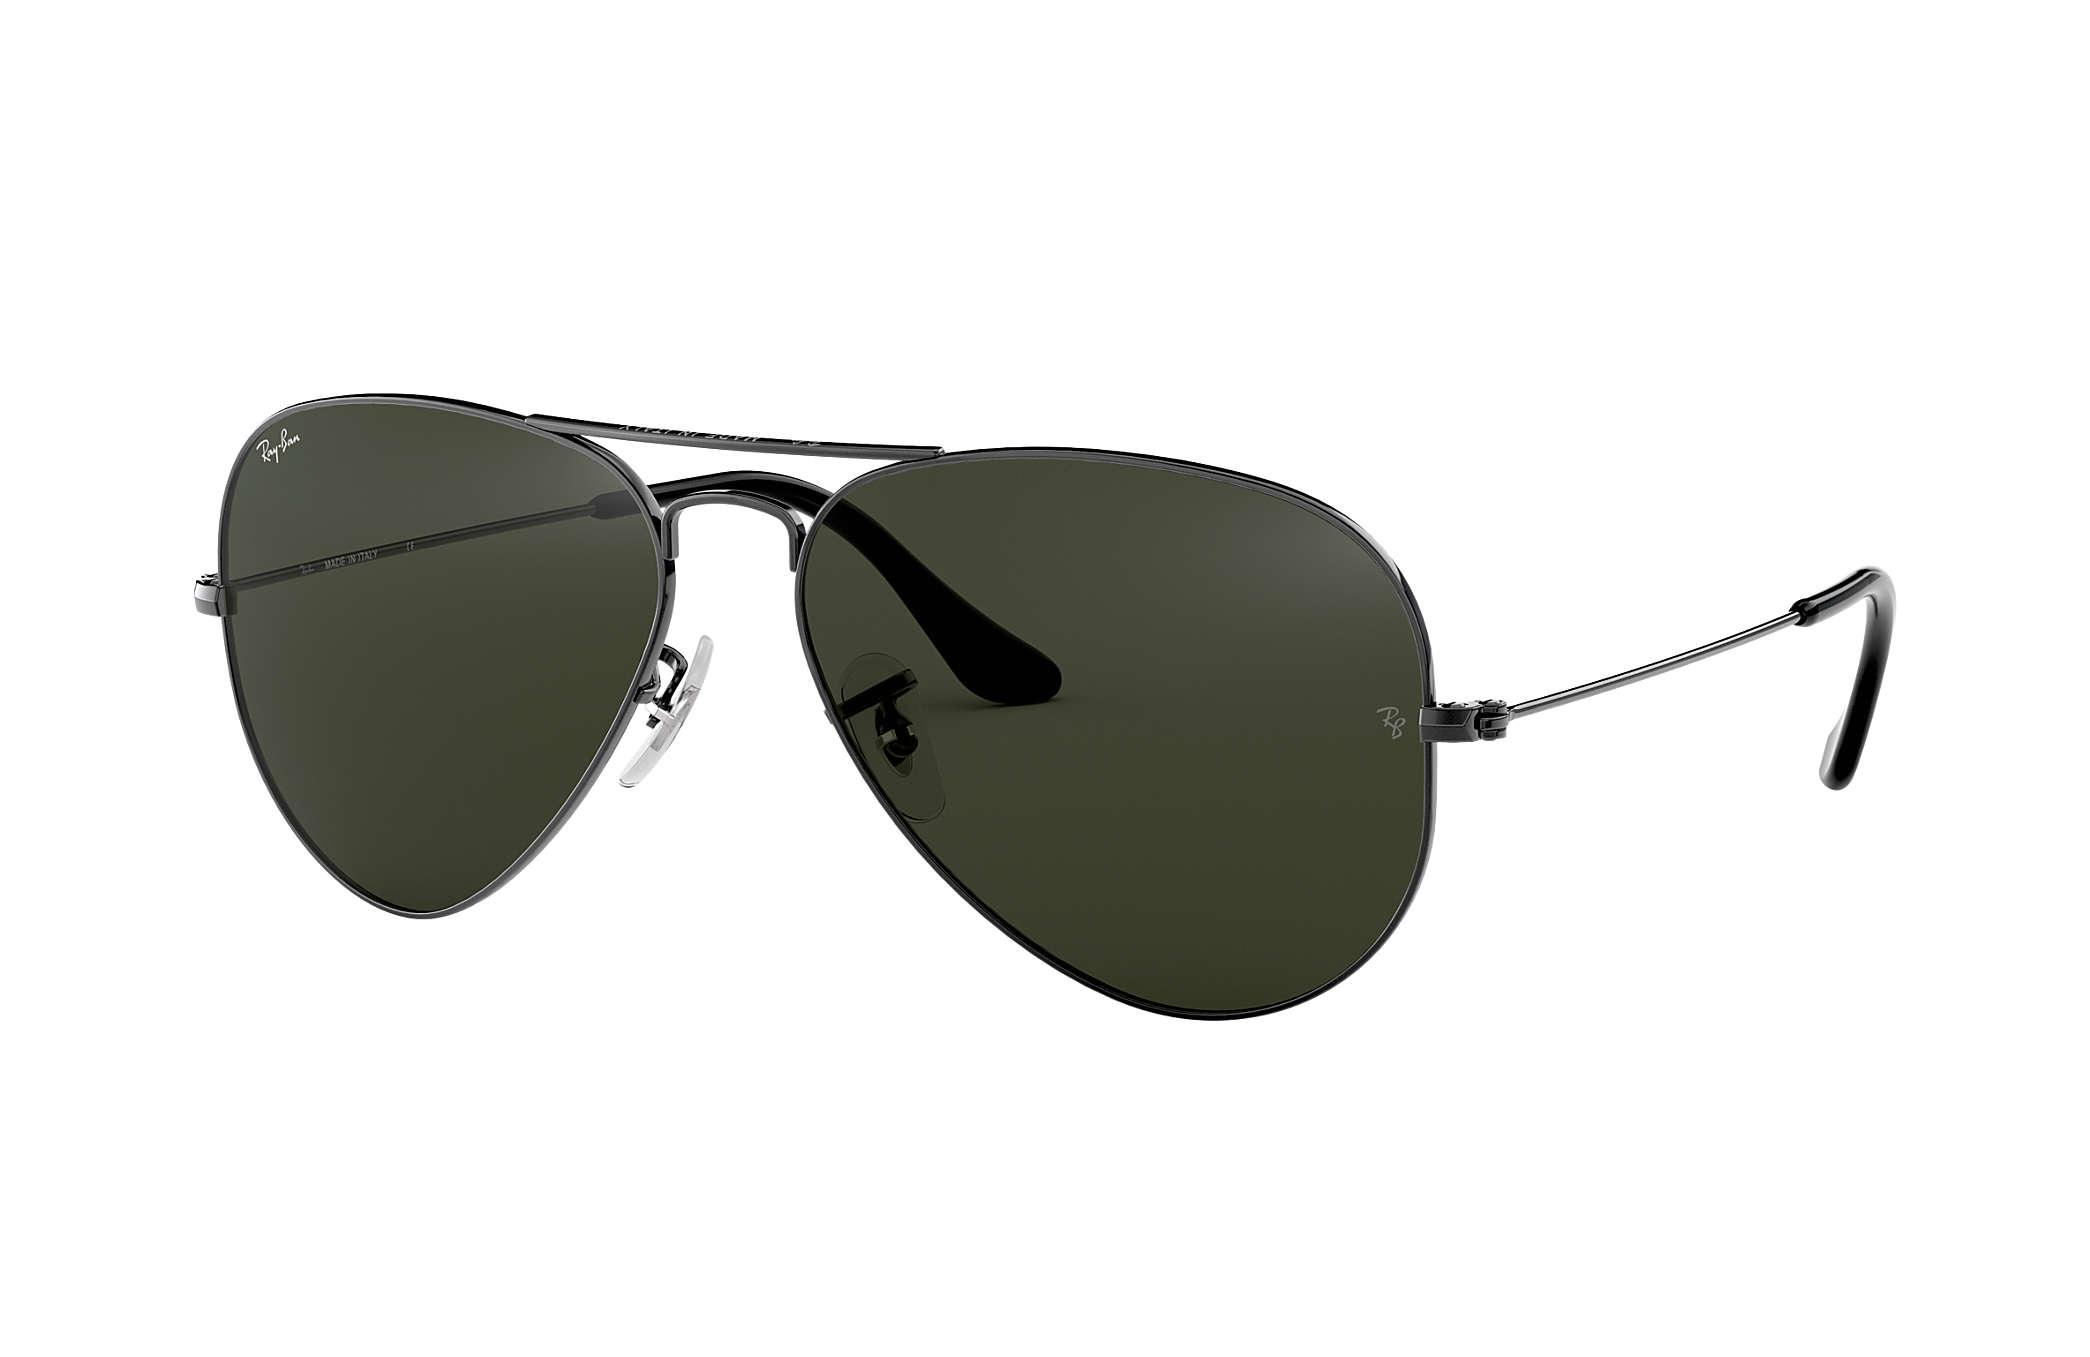 765945bb27ea69 Ray-Ban Aviator Classic RB3025 Gunmetal - Metal - Green Lenses ...